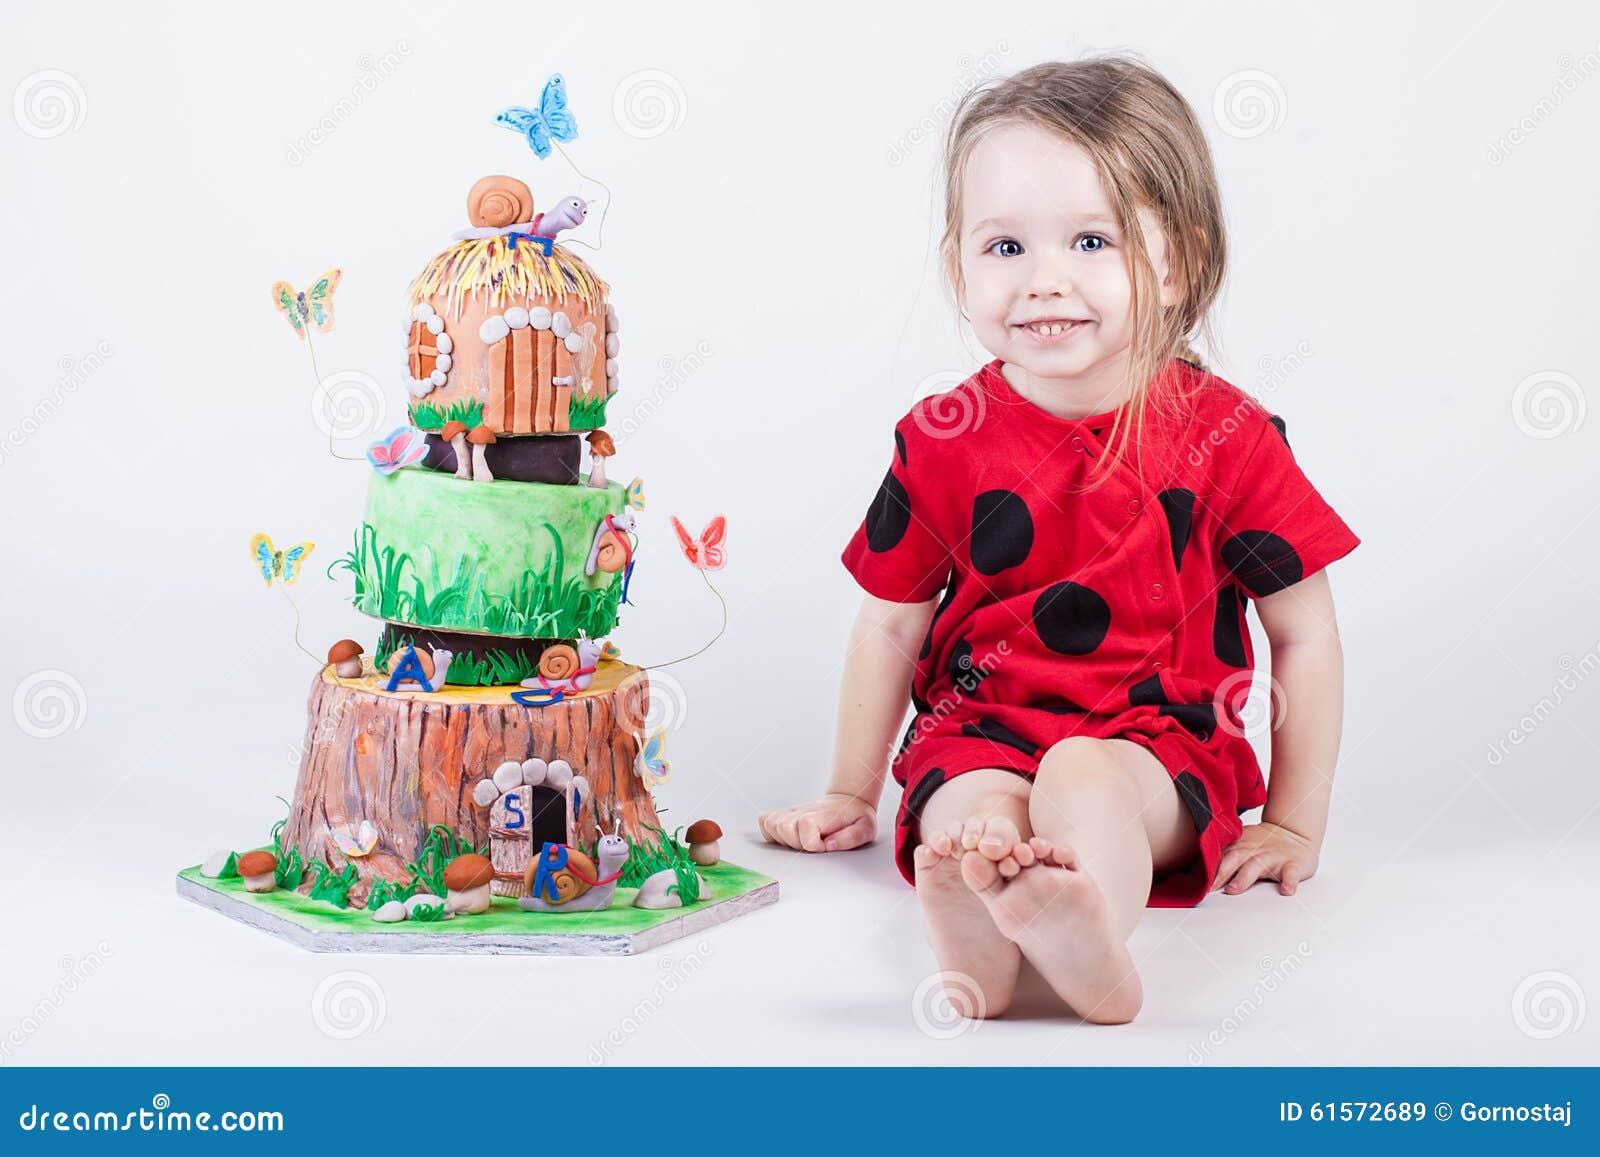 Pleasing Fancy And Pretty Birthday Cake Near Little Child Stock Image Funny Birthday Cards Online Fluifree Goldxyz